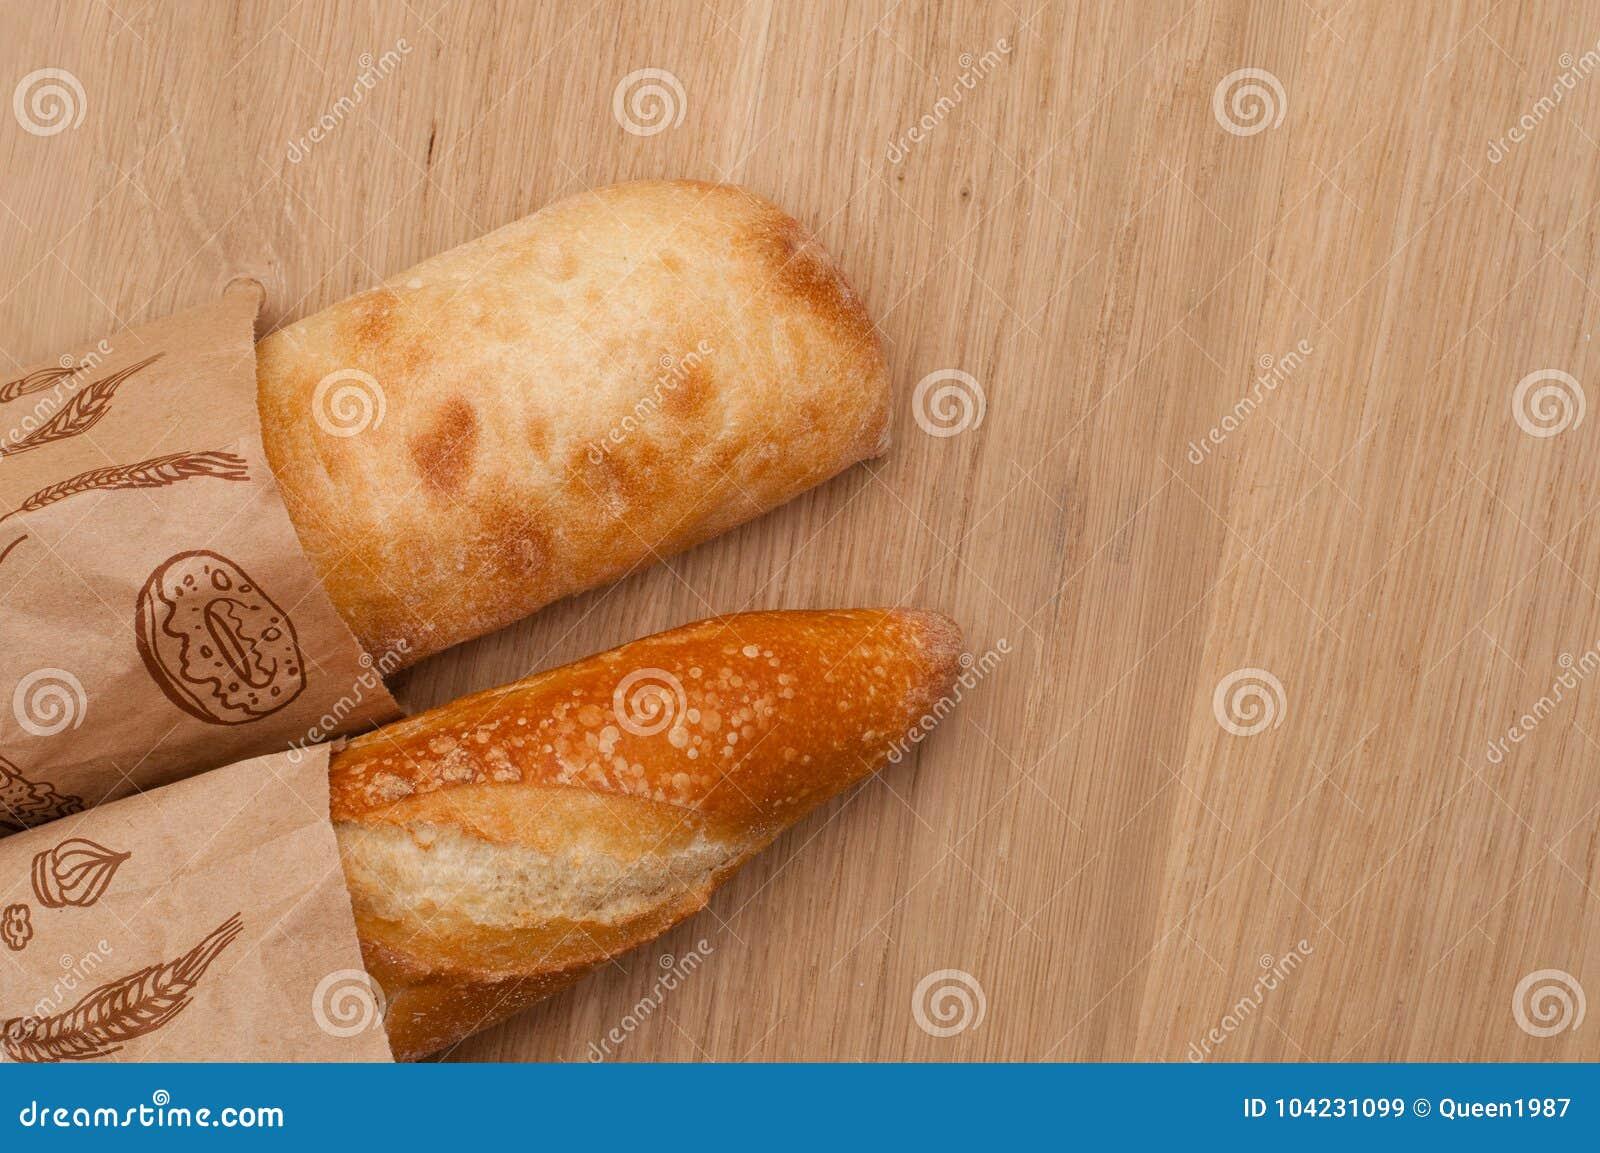 French loaf and Italian ciabatta bread